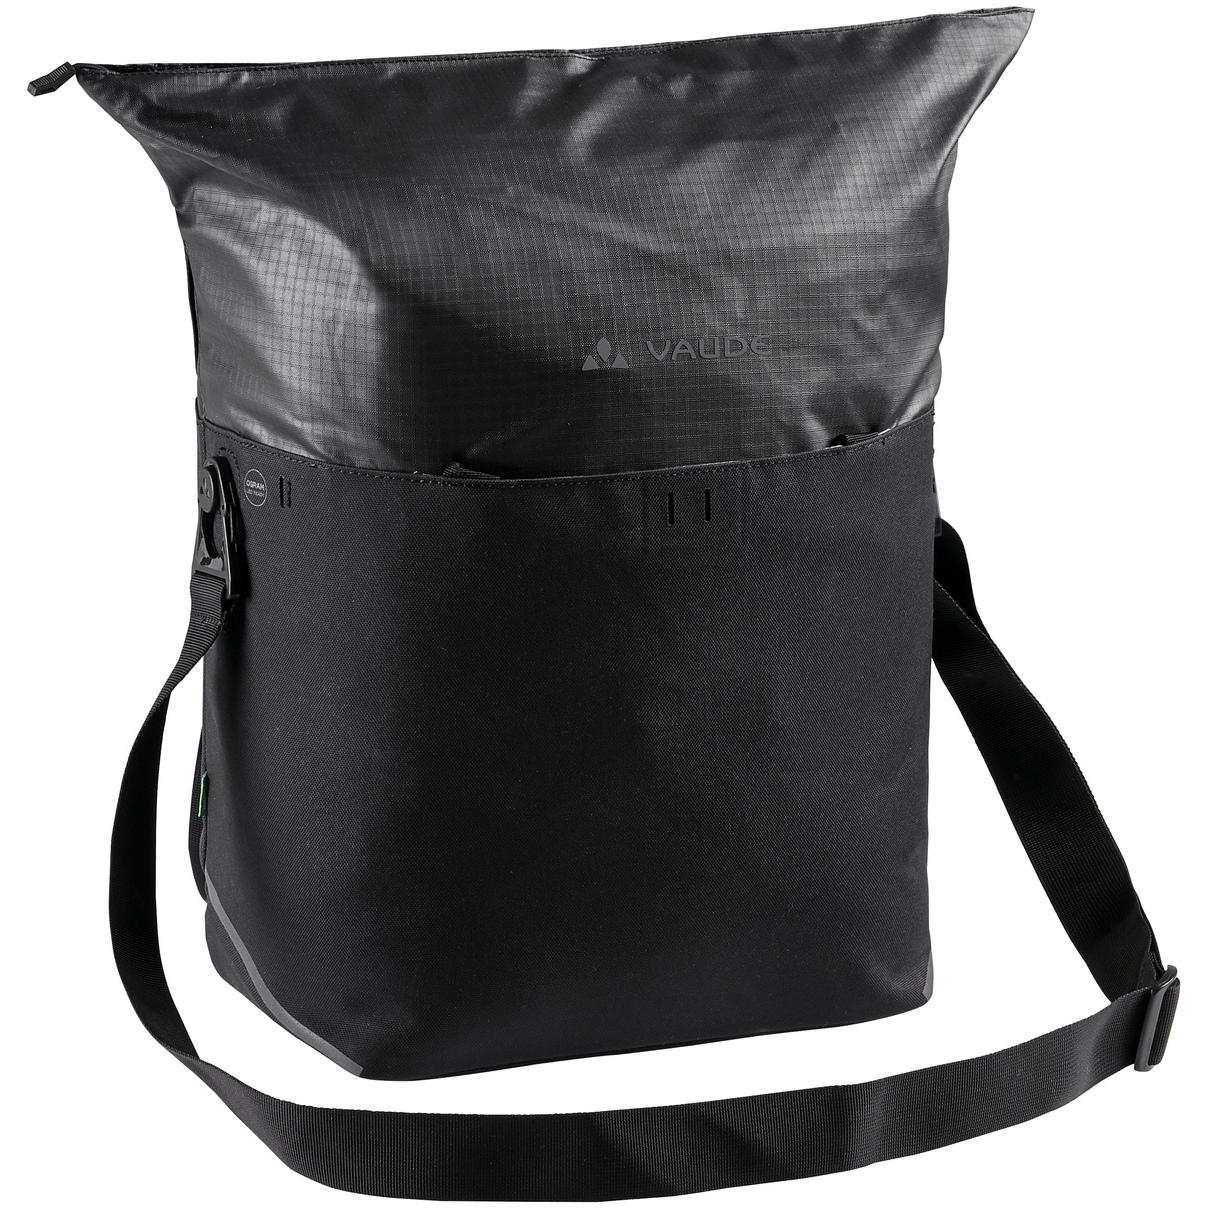 Vaude CityShop Bike Bag - black